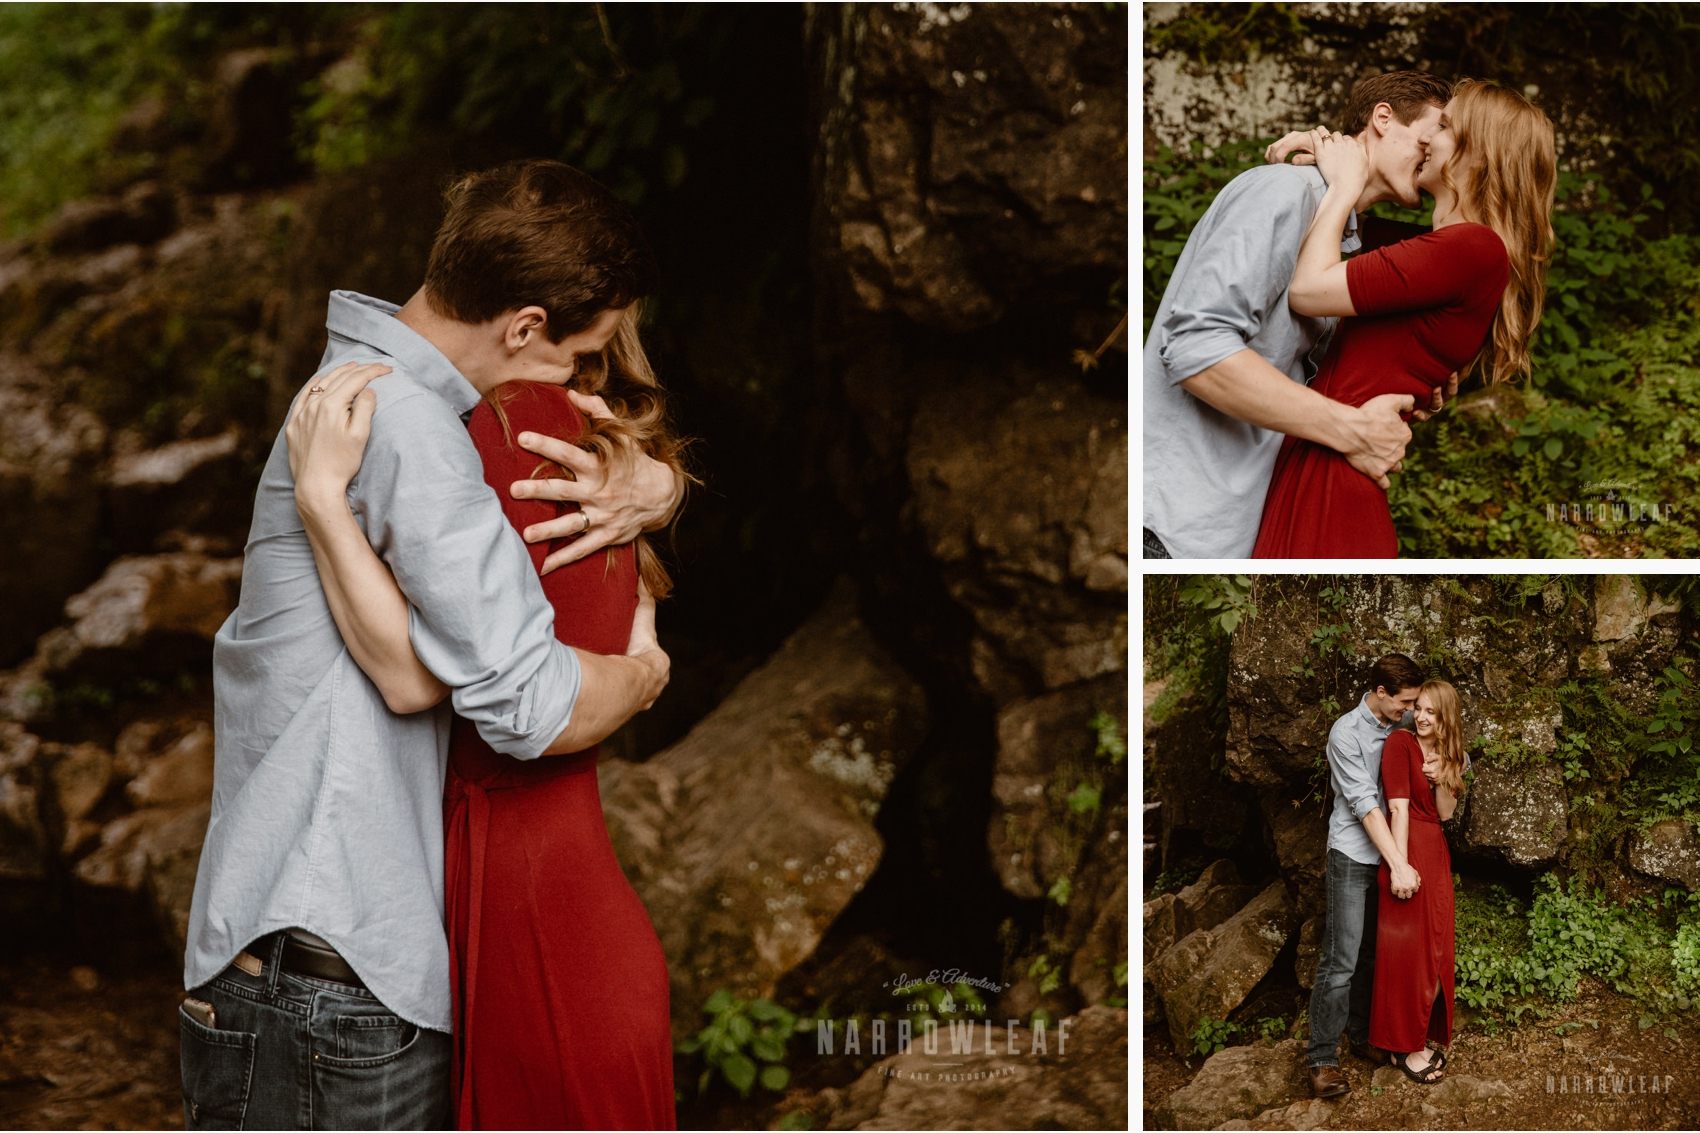 willow-falls-waterfall-adventure-engagement-photographer-001-002.jpg